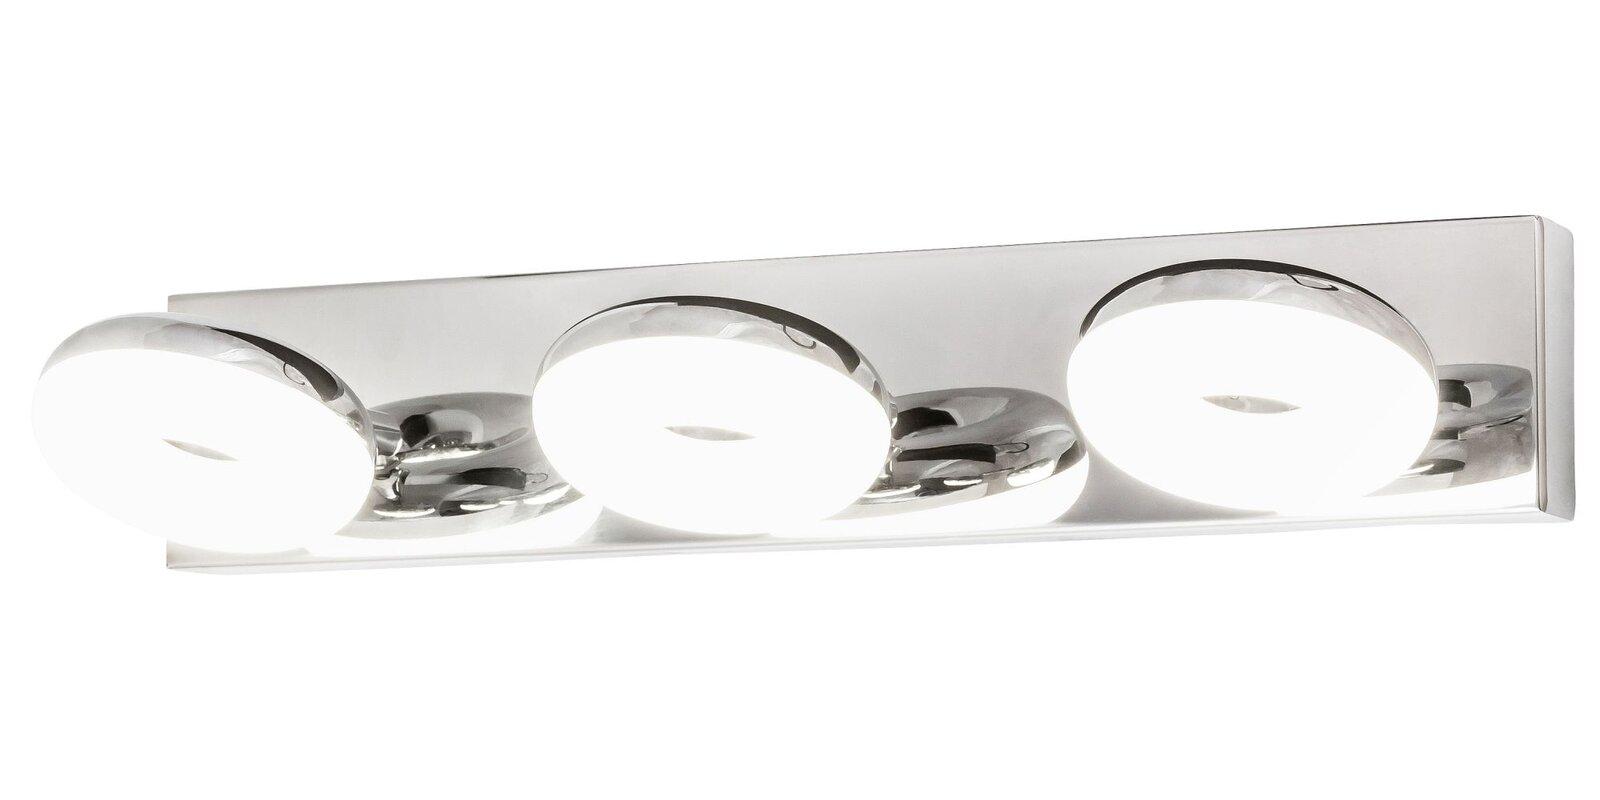 Perspections LED-Spiegellampe 3-flammig McTeer